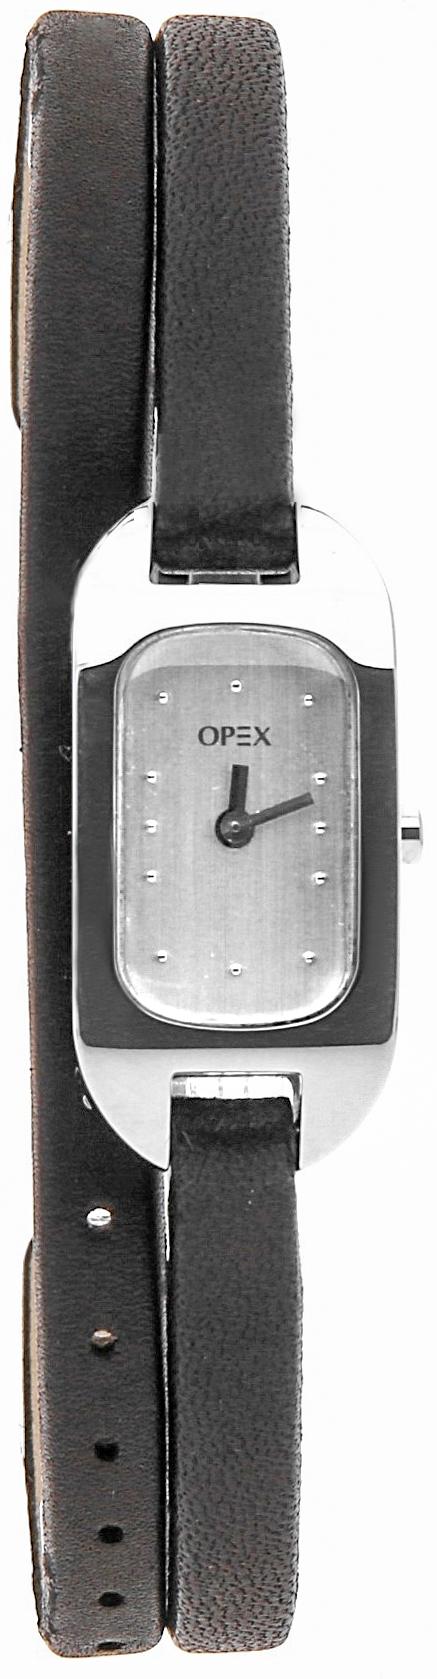 Opex 390A2P - zegarek damski